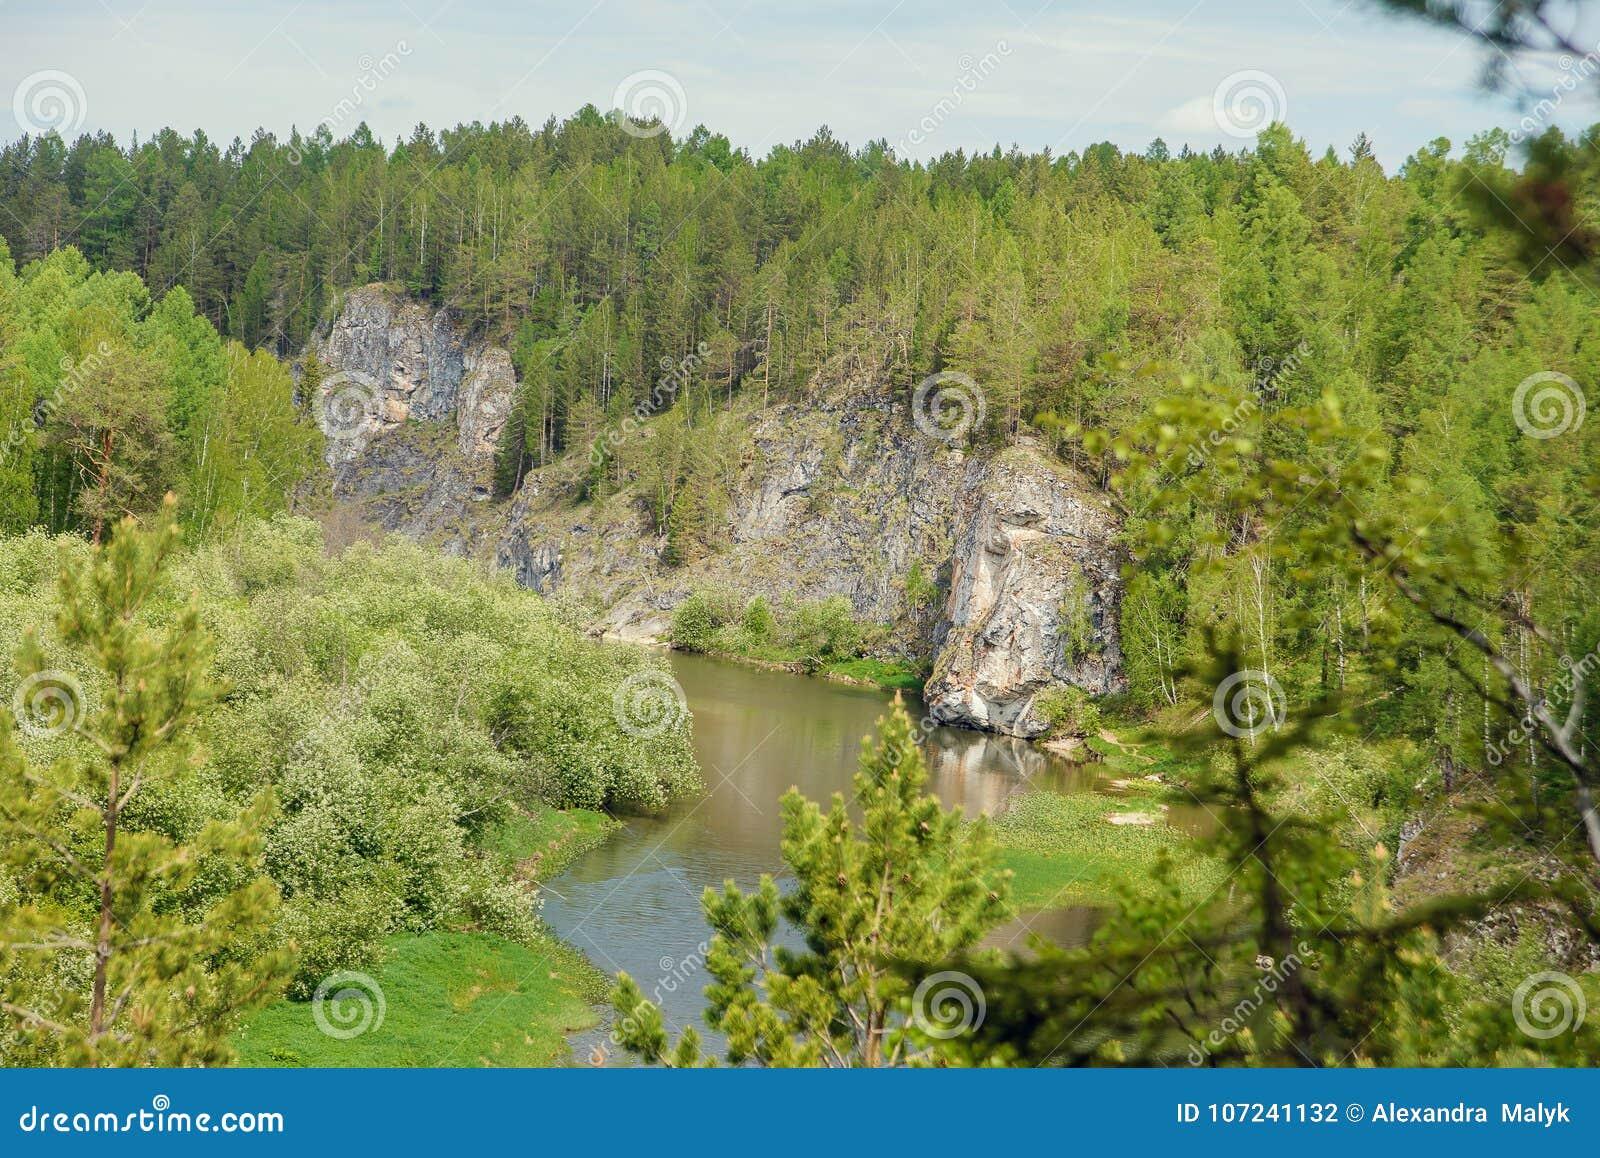 Natural tourism: Russia vs America